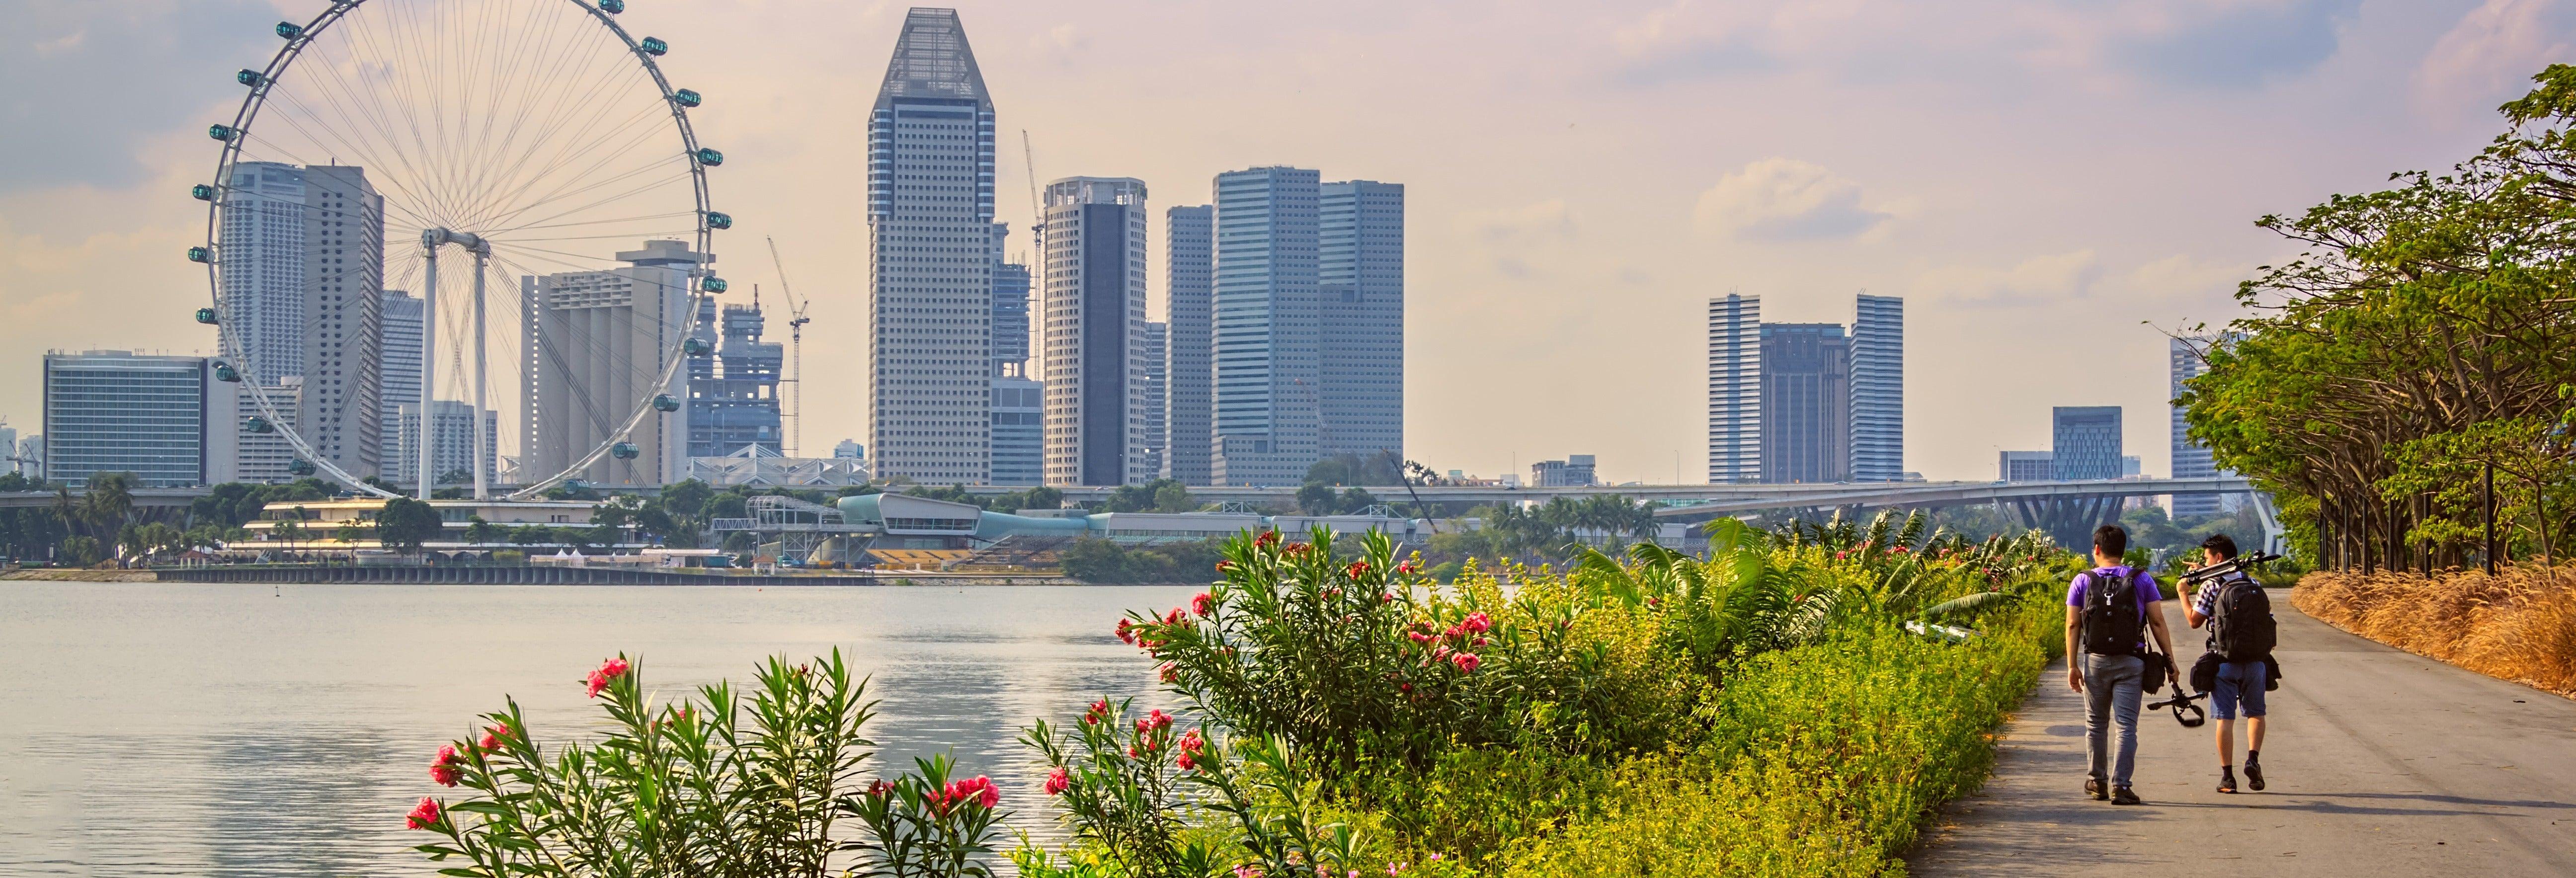 Tour privado por Singapur con guía en español